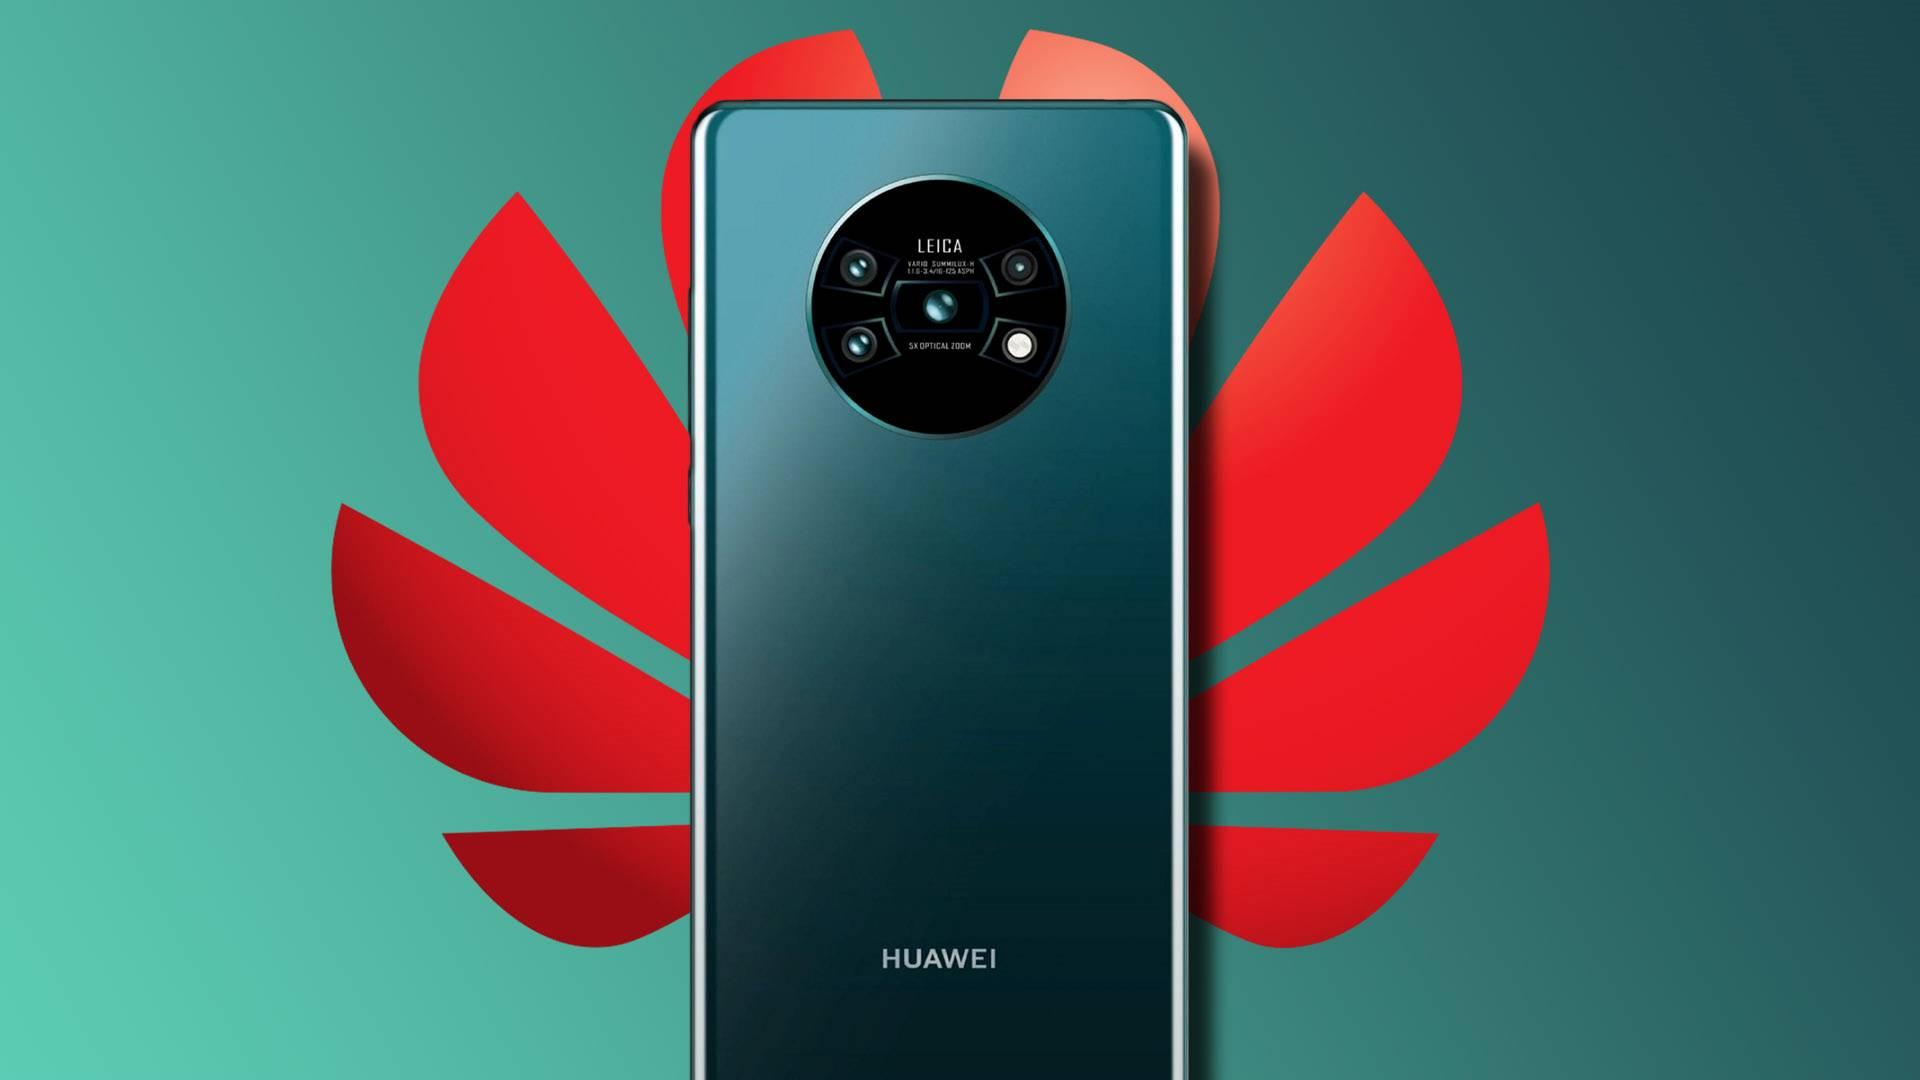 Huawei MATE 30 PRO. Va COPIA o Functie MAJORA din iPhone XS